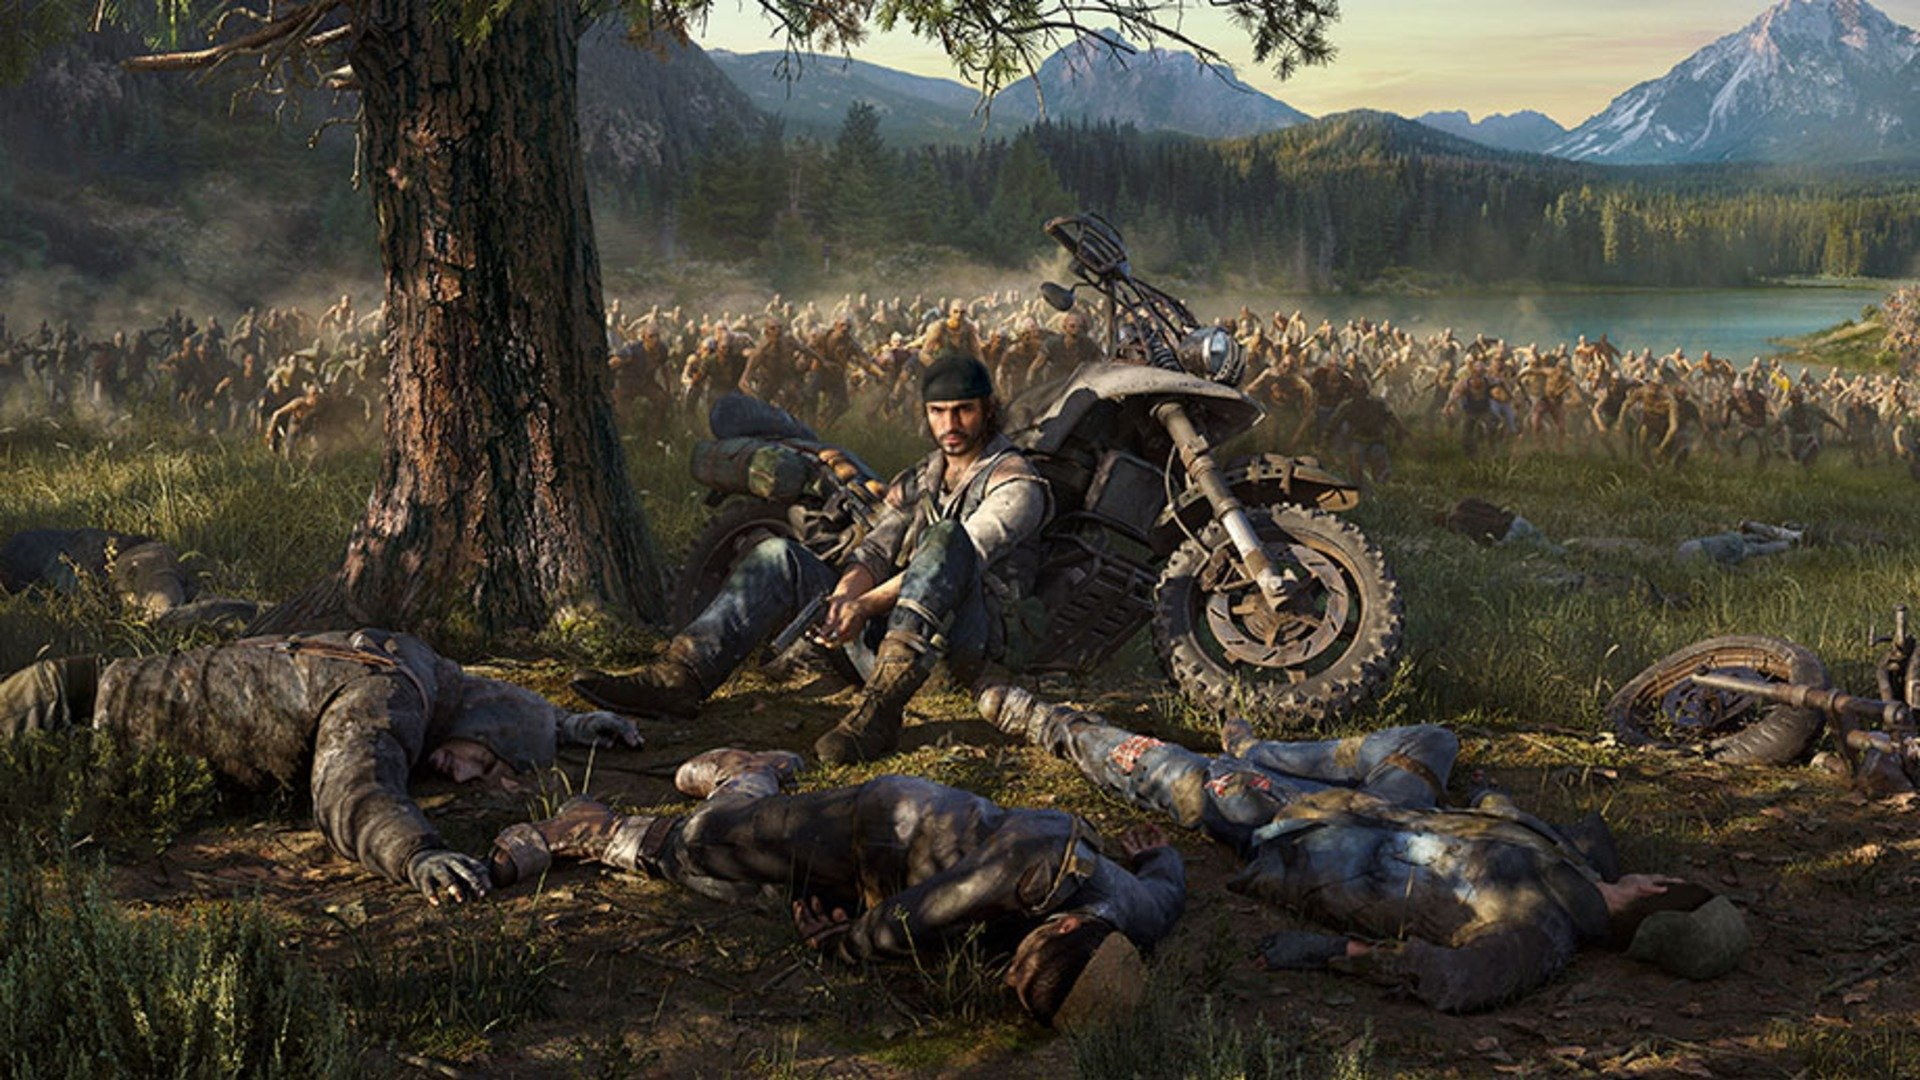 Vroom Vroom VROOOOMMMM goes the Days Gone motorcycle screenshot